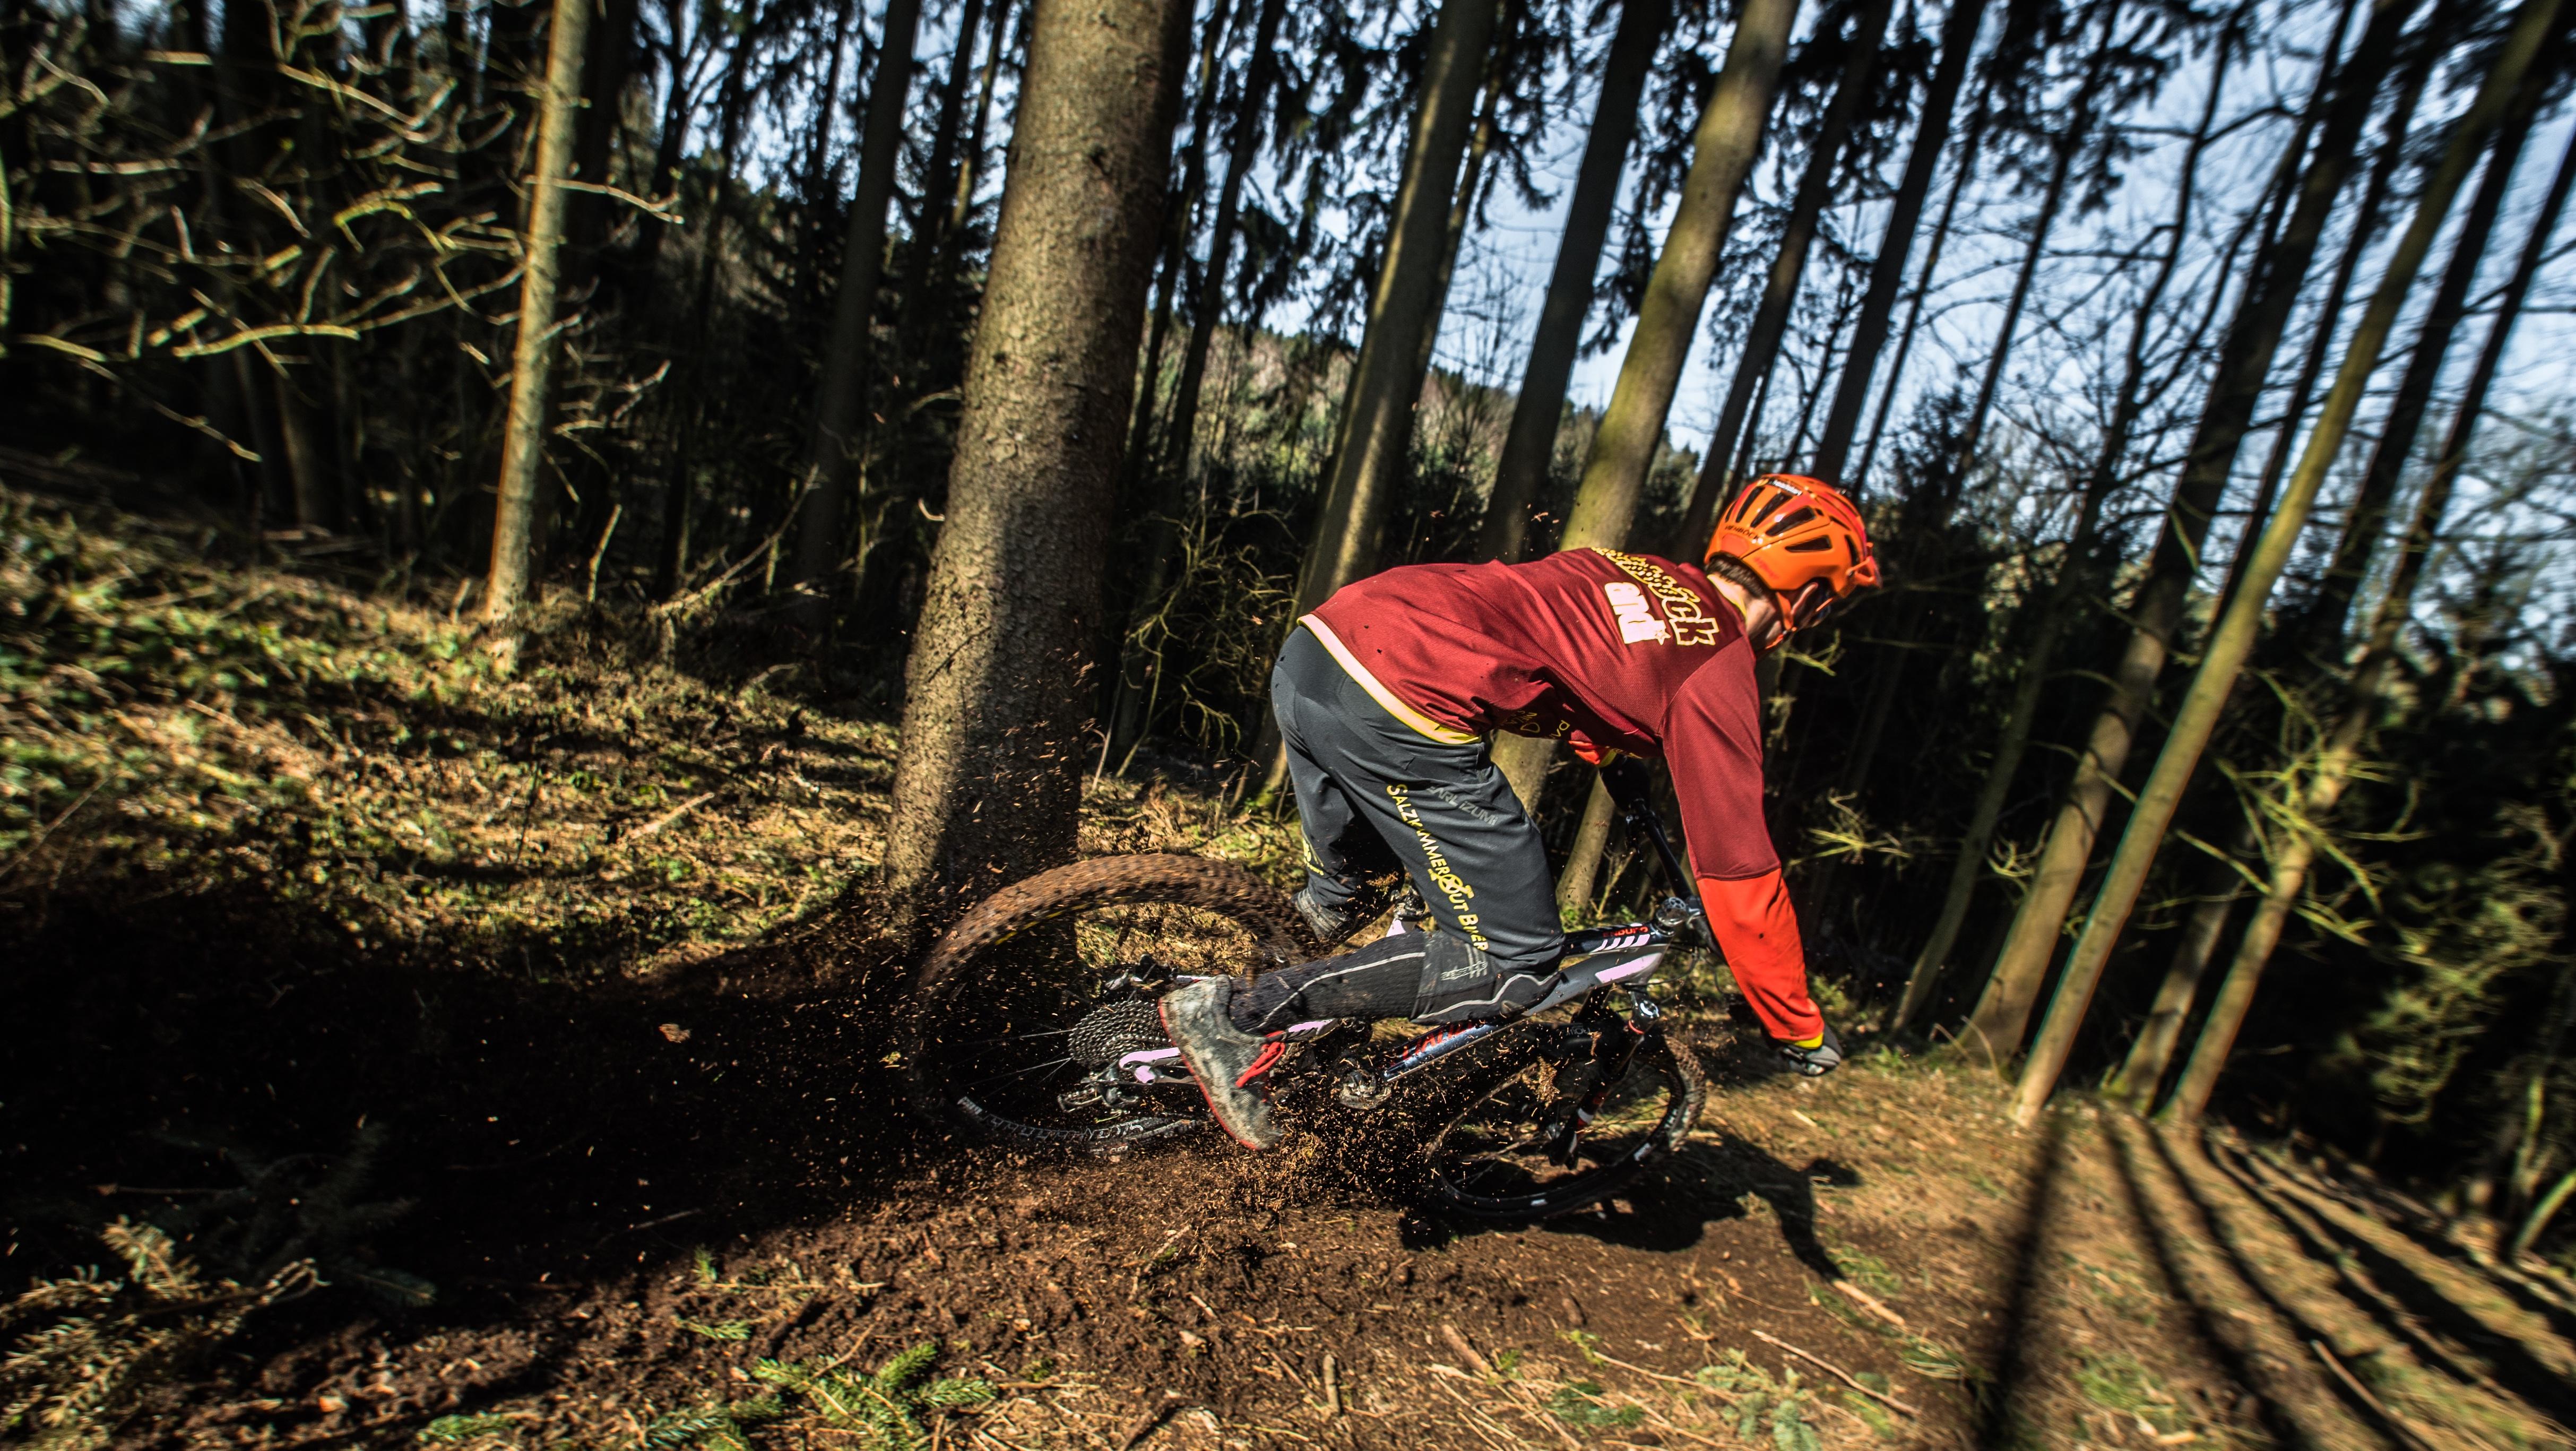 Kostenlose foto : Baum, Wald, Weg, Abenteuer, Fahrrad, Fahrzeug ...